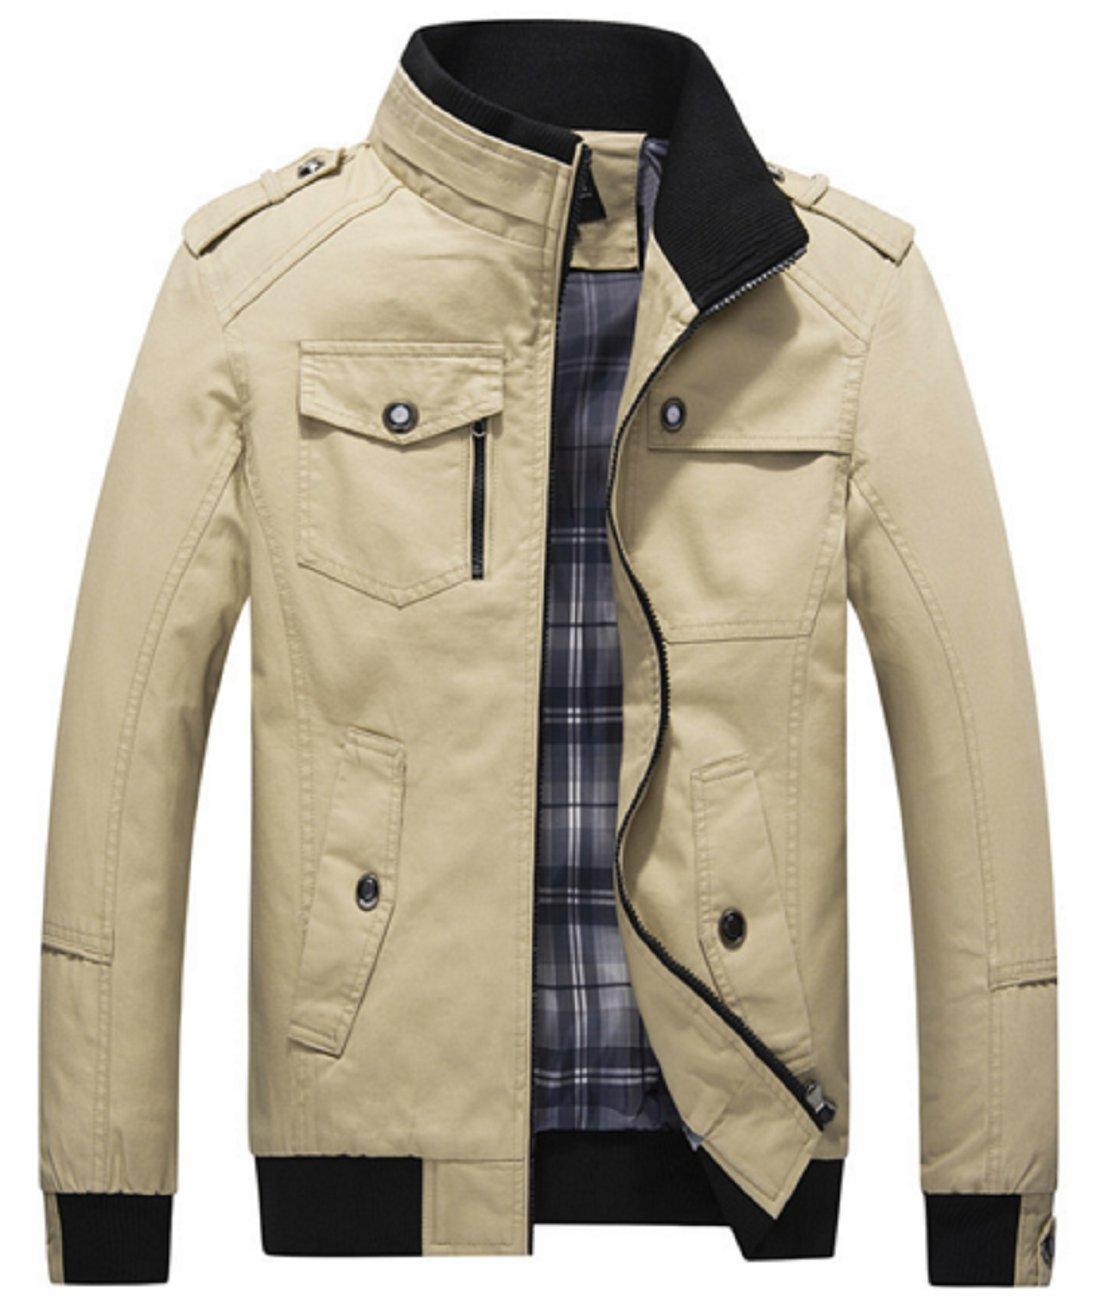 Olrek Men's Autumn and Fall Stand Colllar Outerwear Jacket Coat(Khaki,Medium)